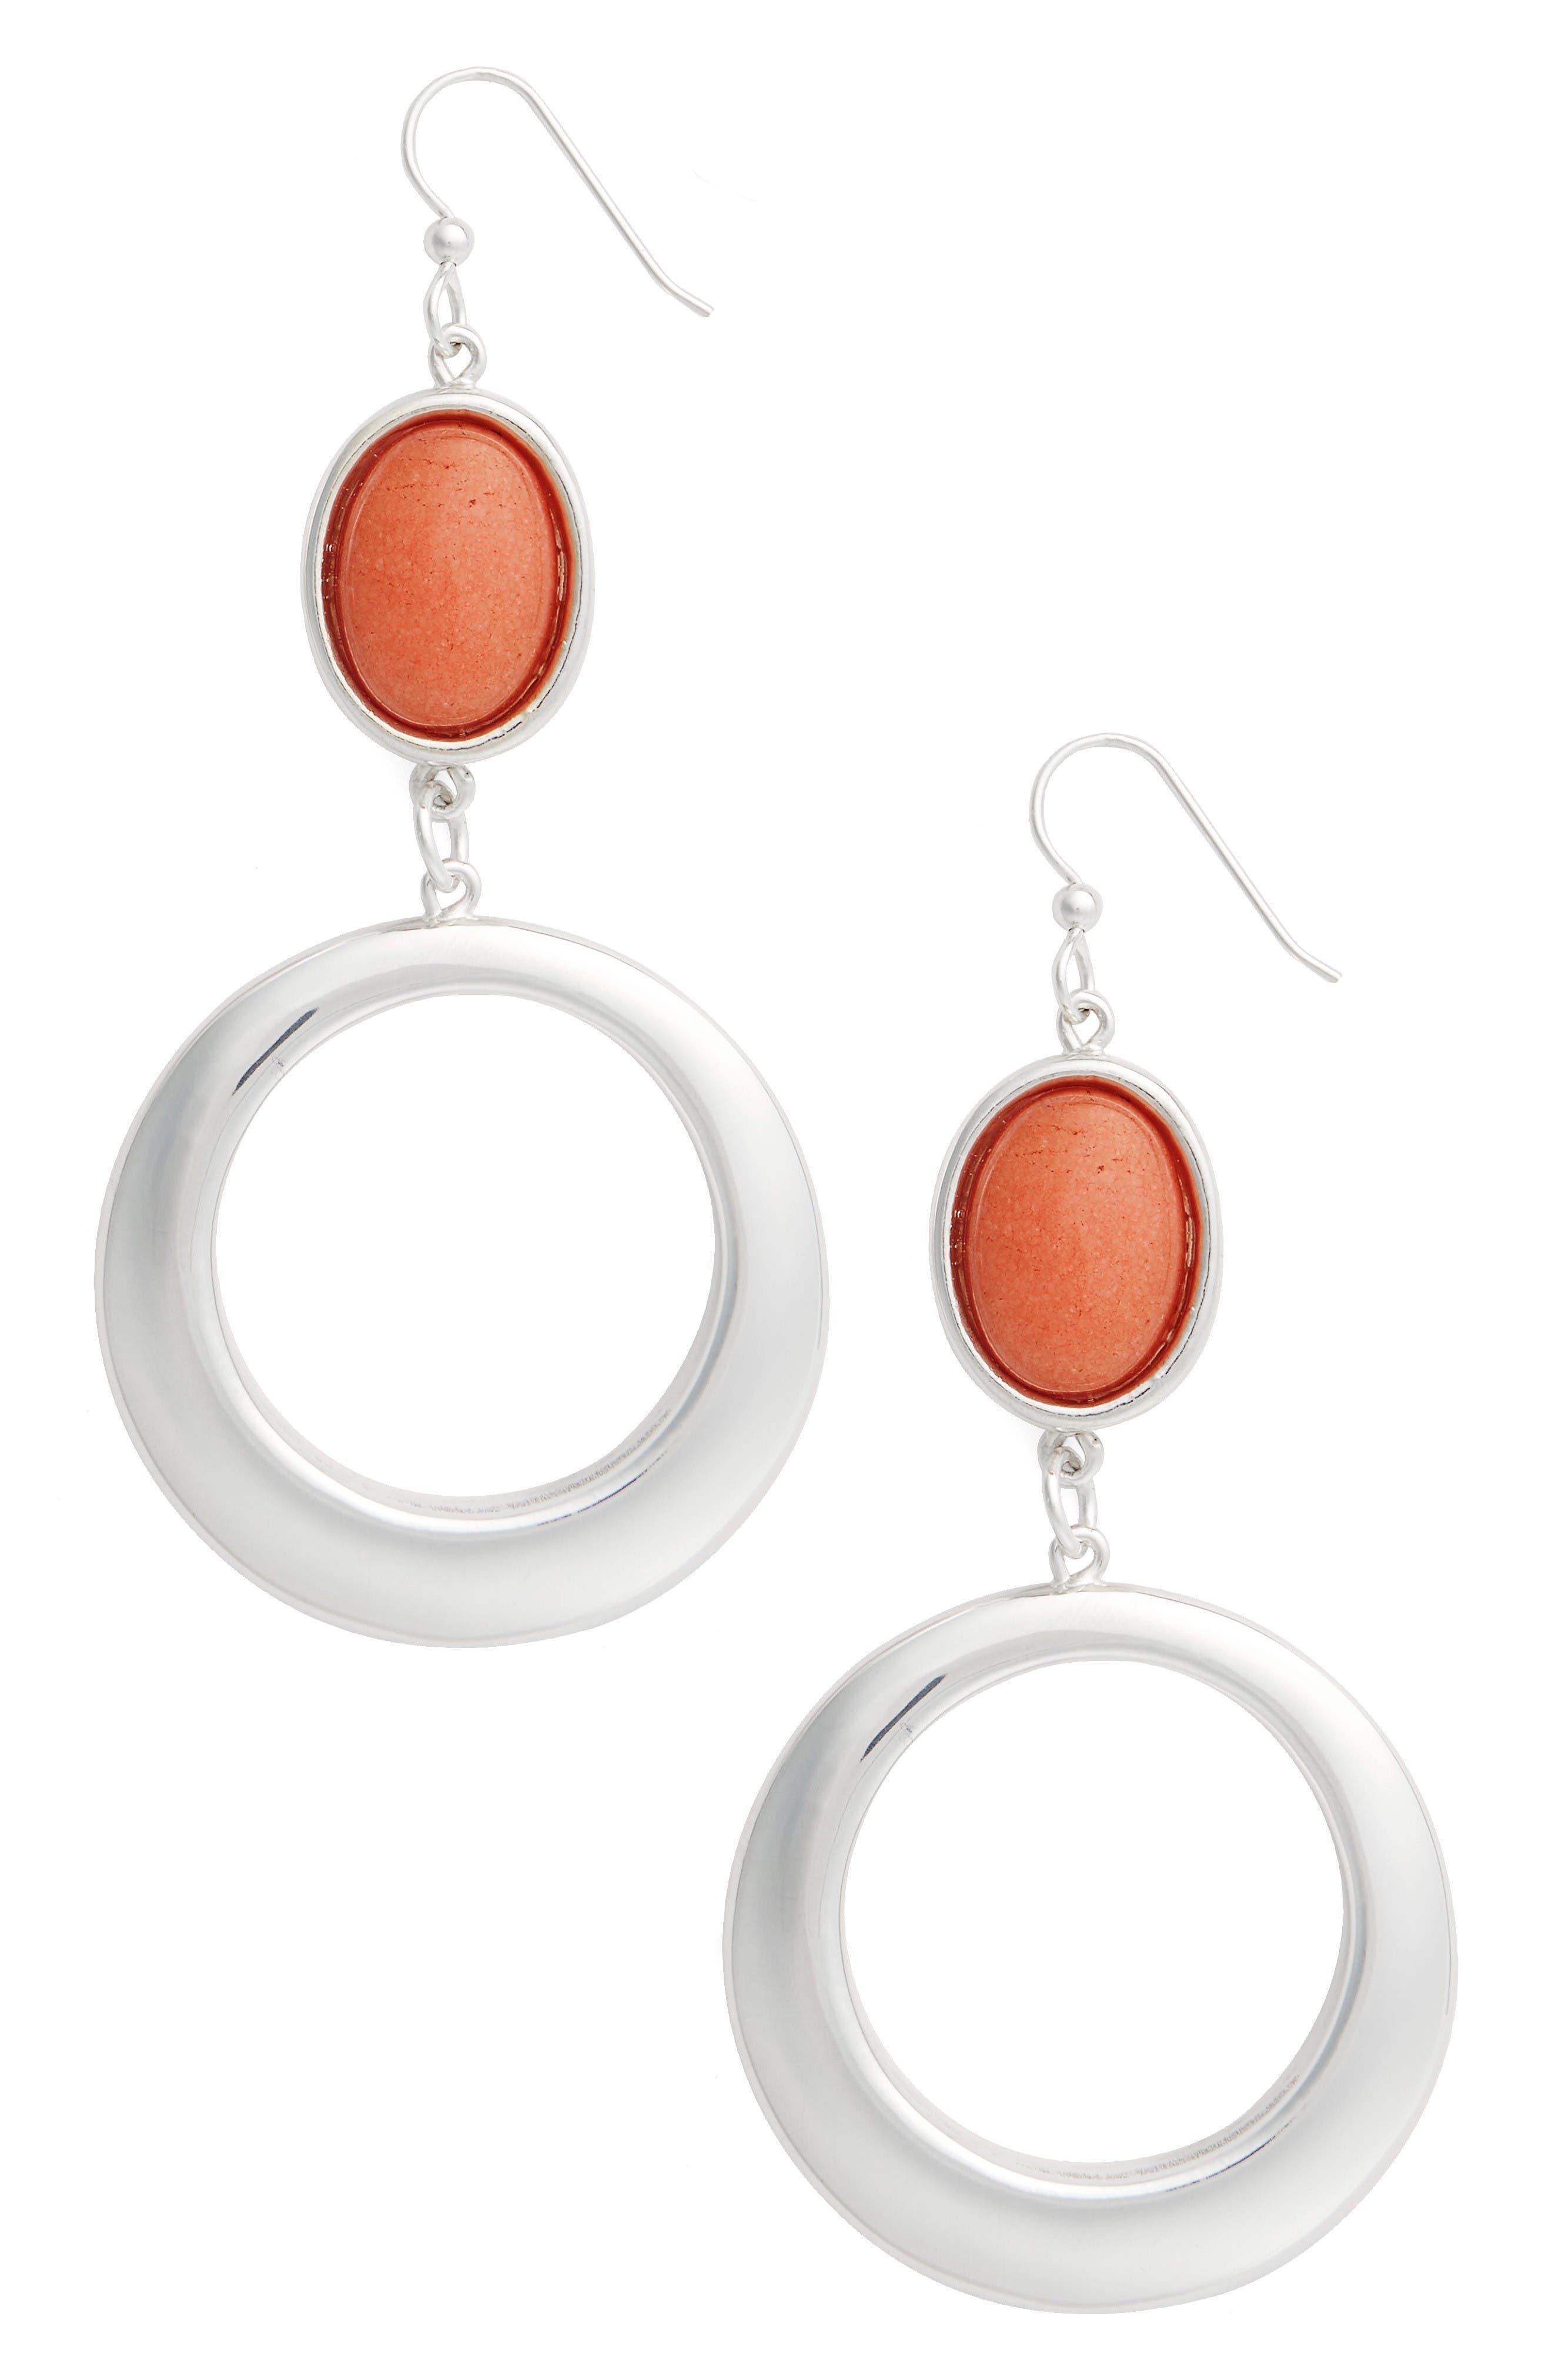 Semiprecious Stone Hoop Drop Earrings,                         Main,                         color, Orange/ Silver